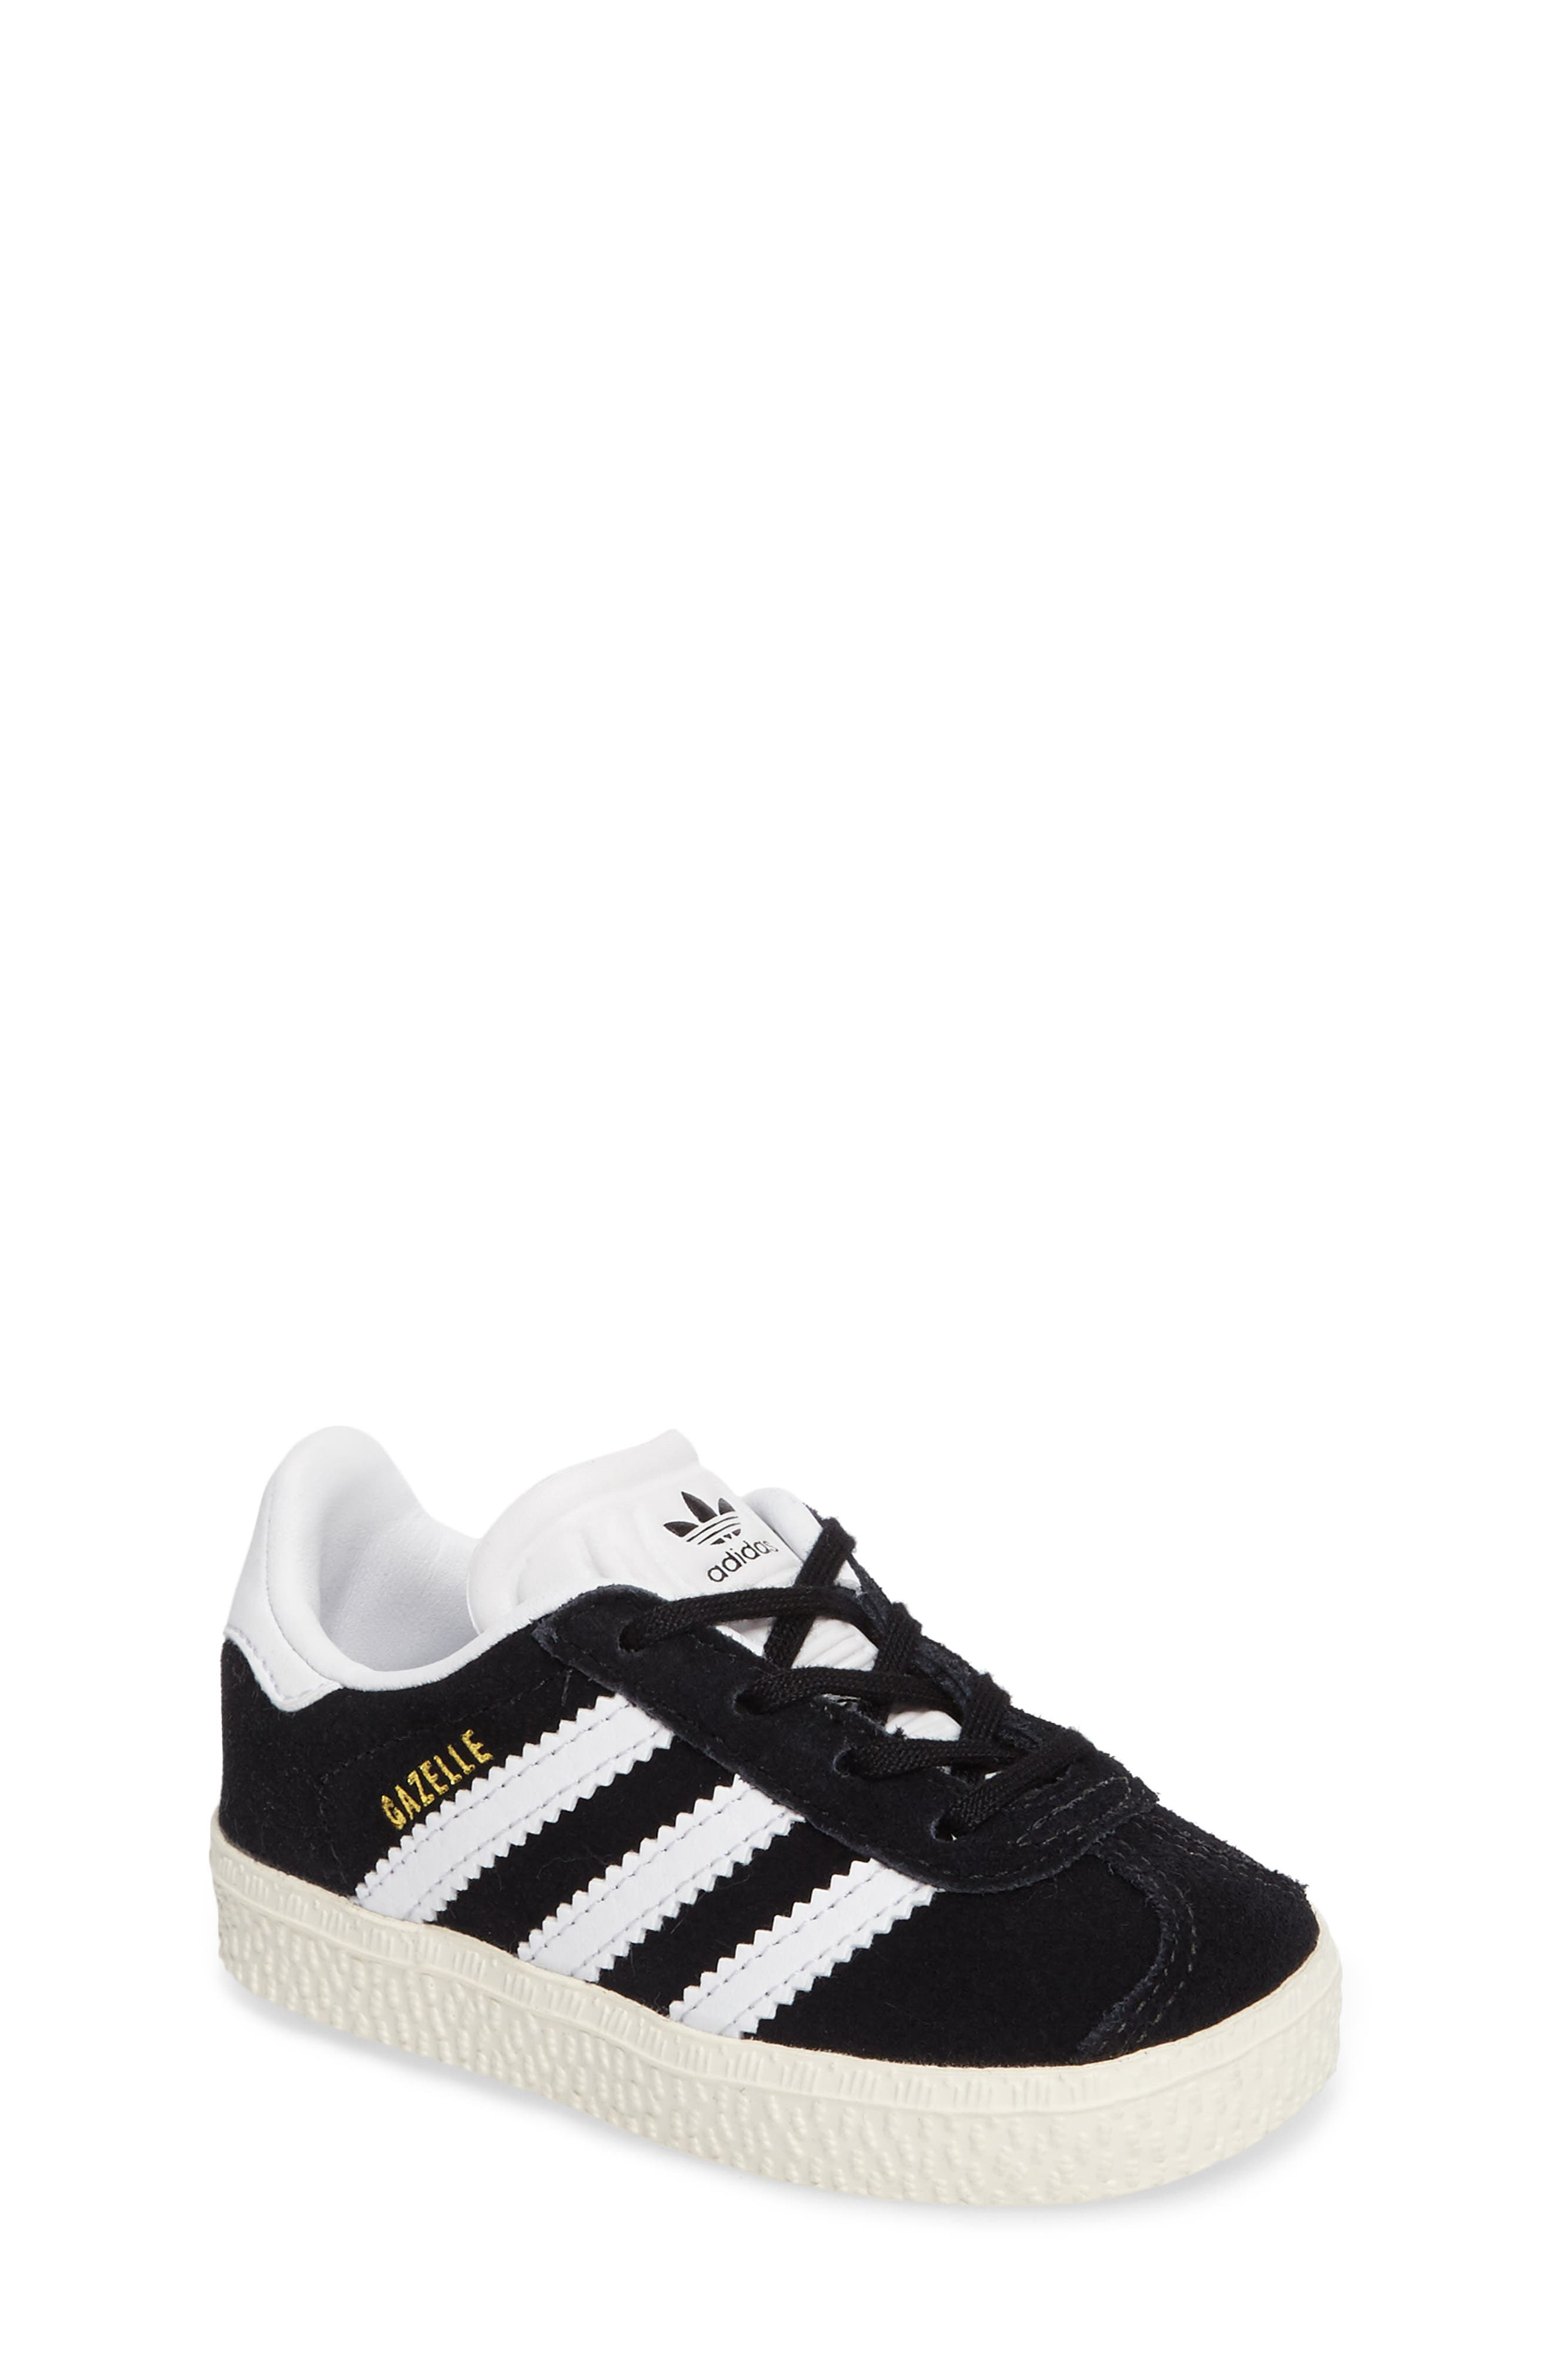 Black adidas for Kids: Activewear & Shoes | Nordstrom